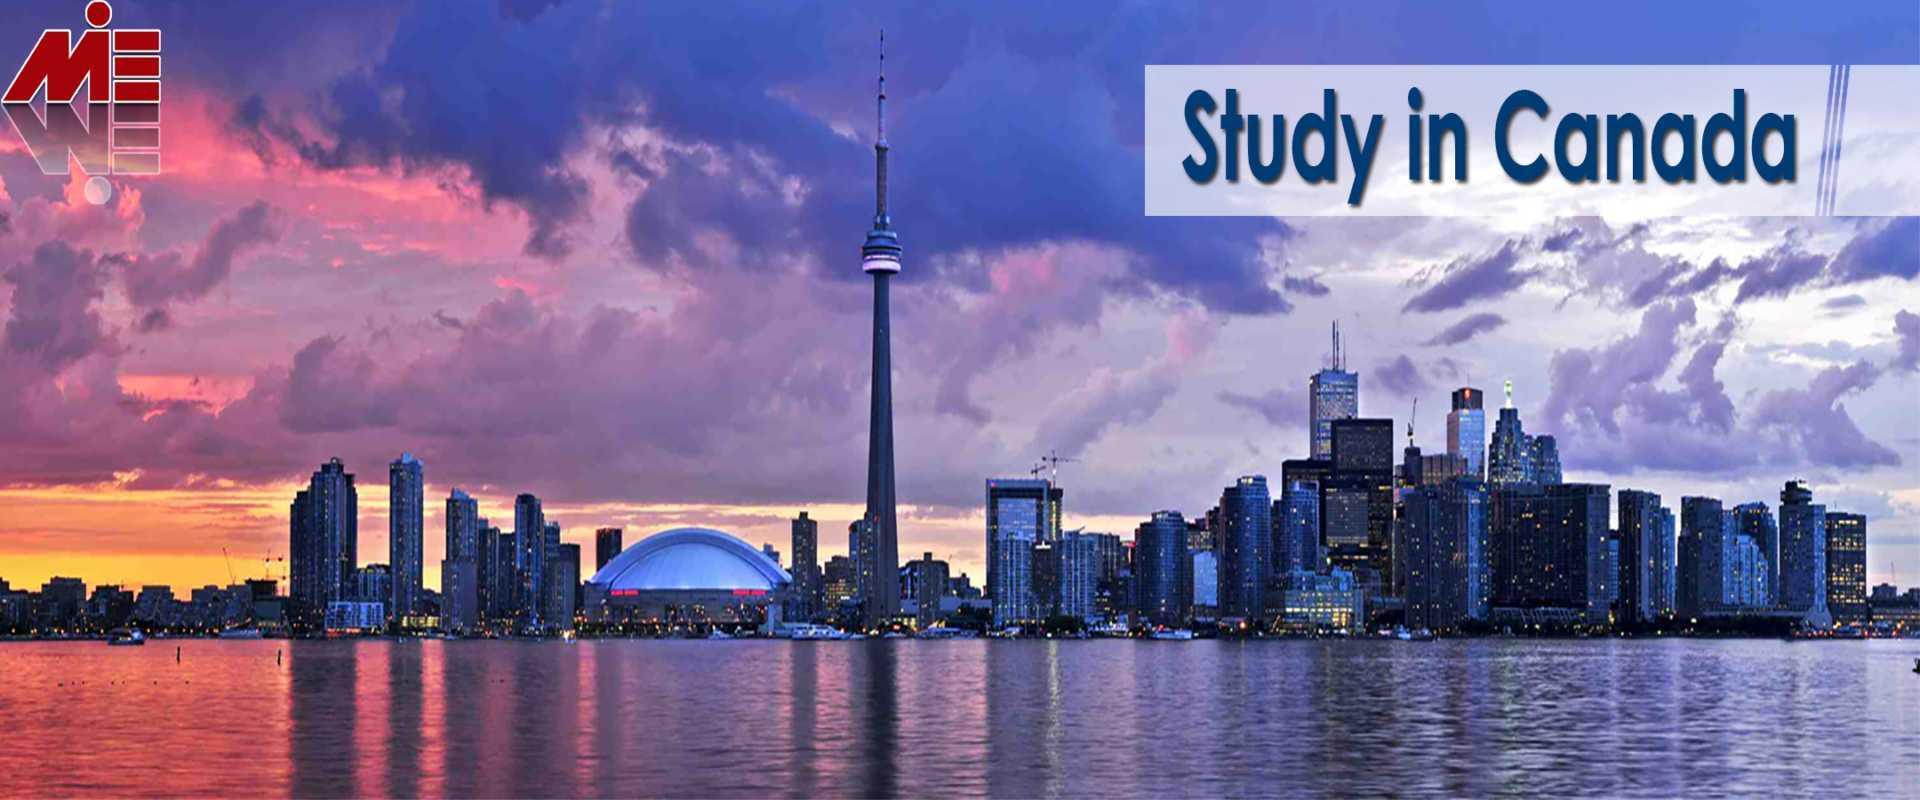 SC2 اعزام دانشجو به کانادا